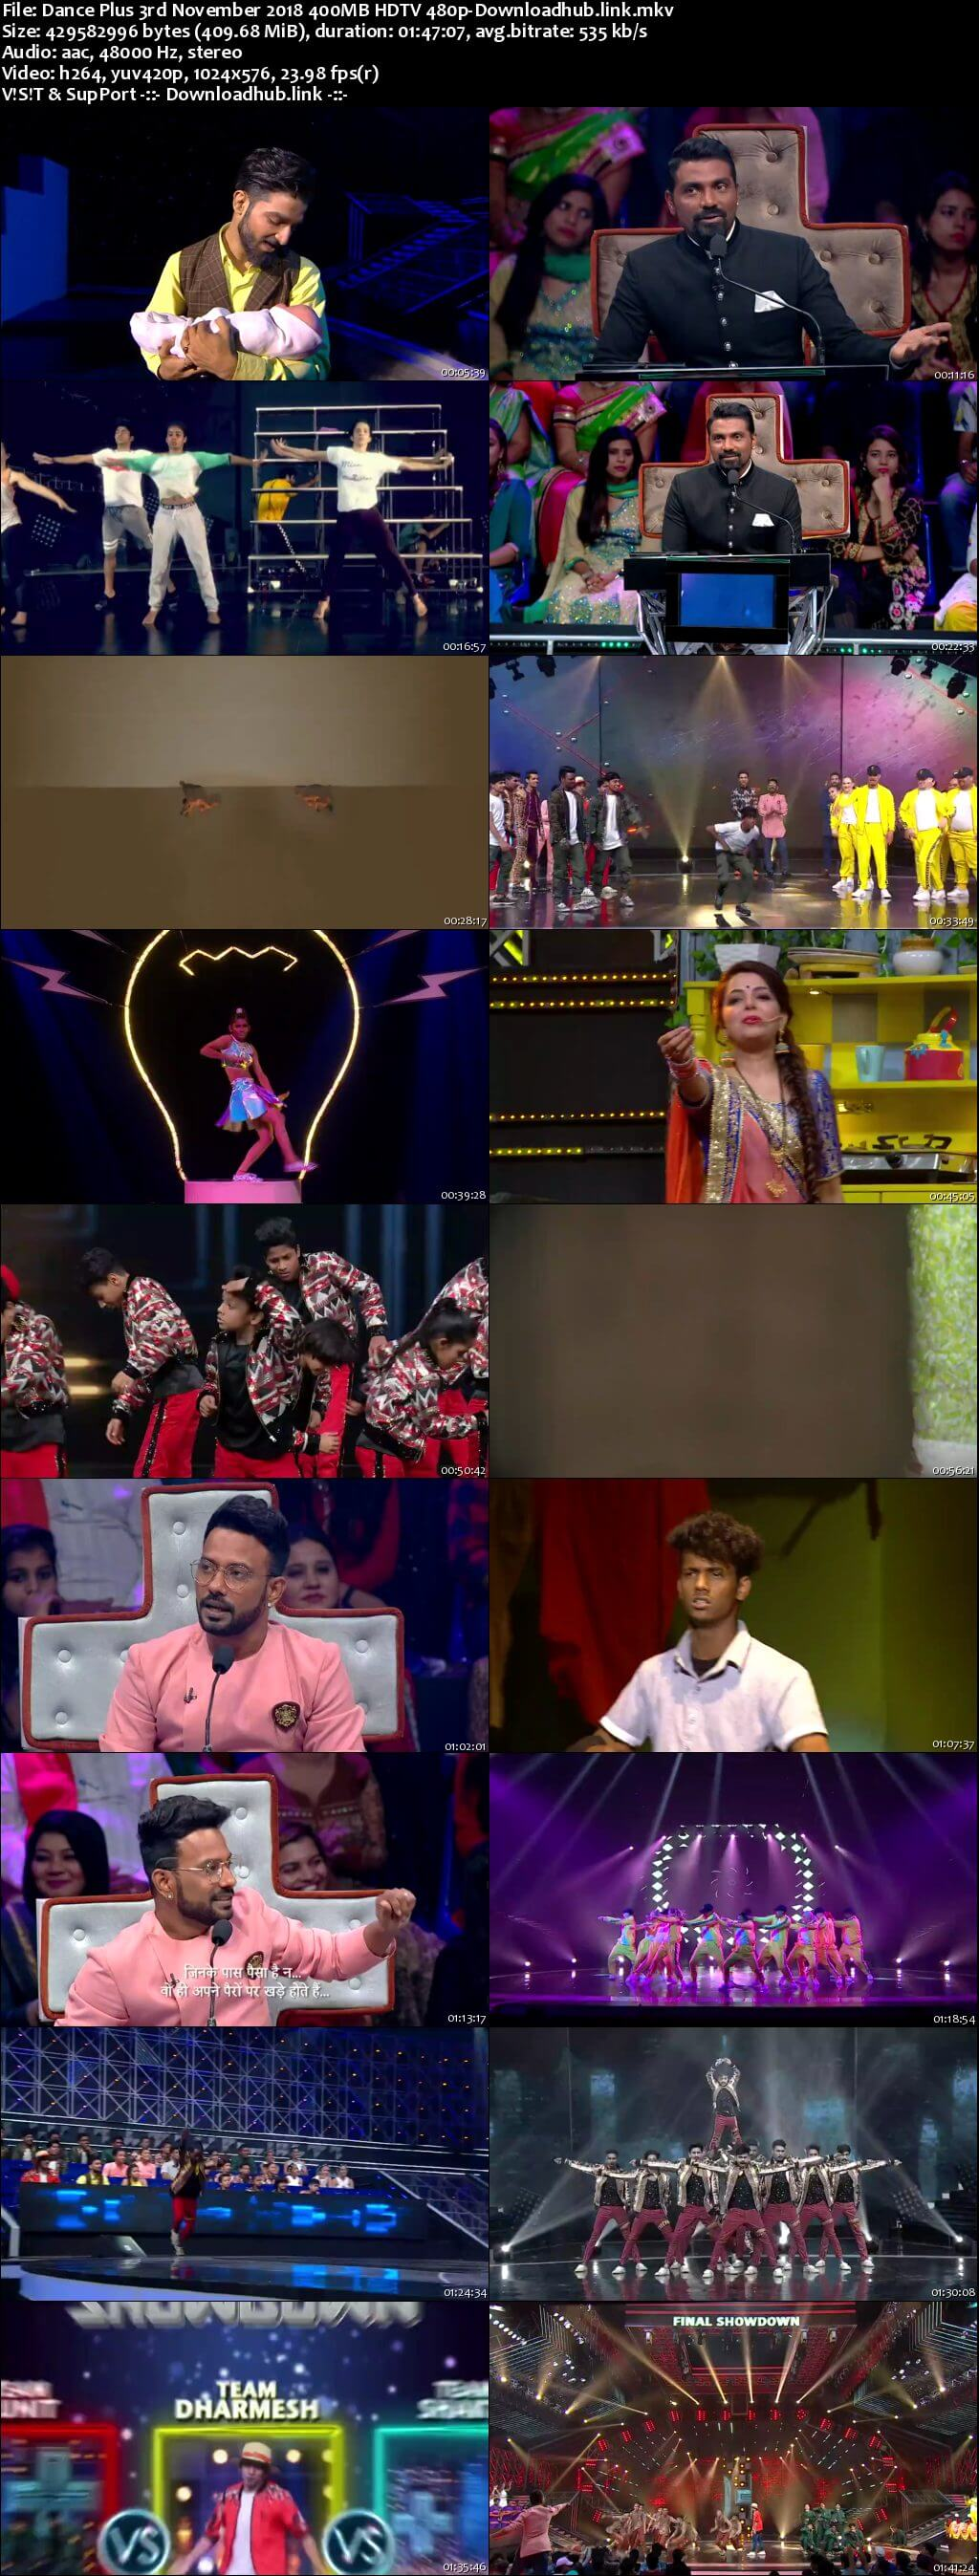 Dance Plus Season 4 03 November 2018 Episode 09 HDTV 480p